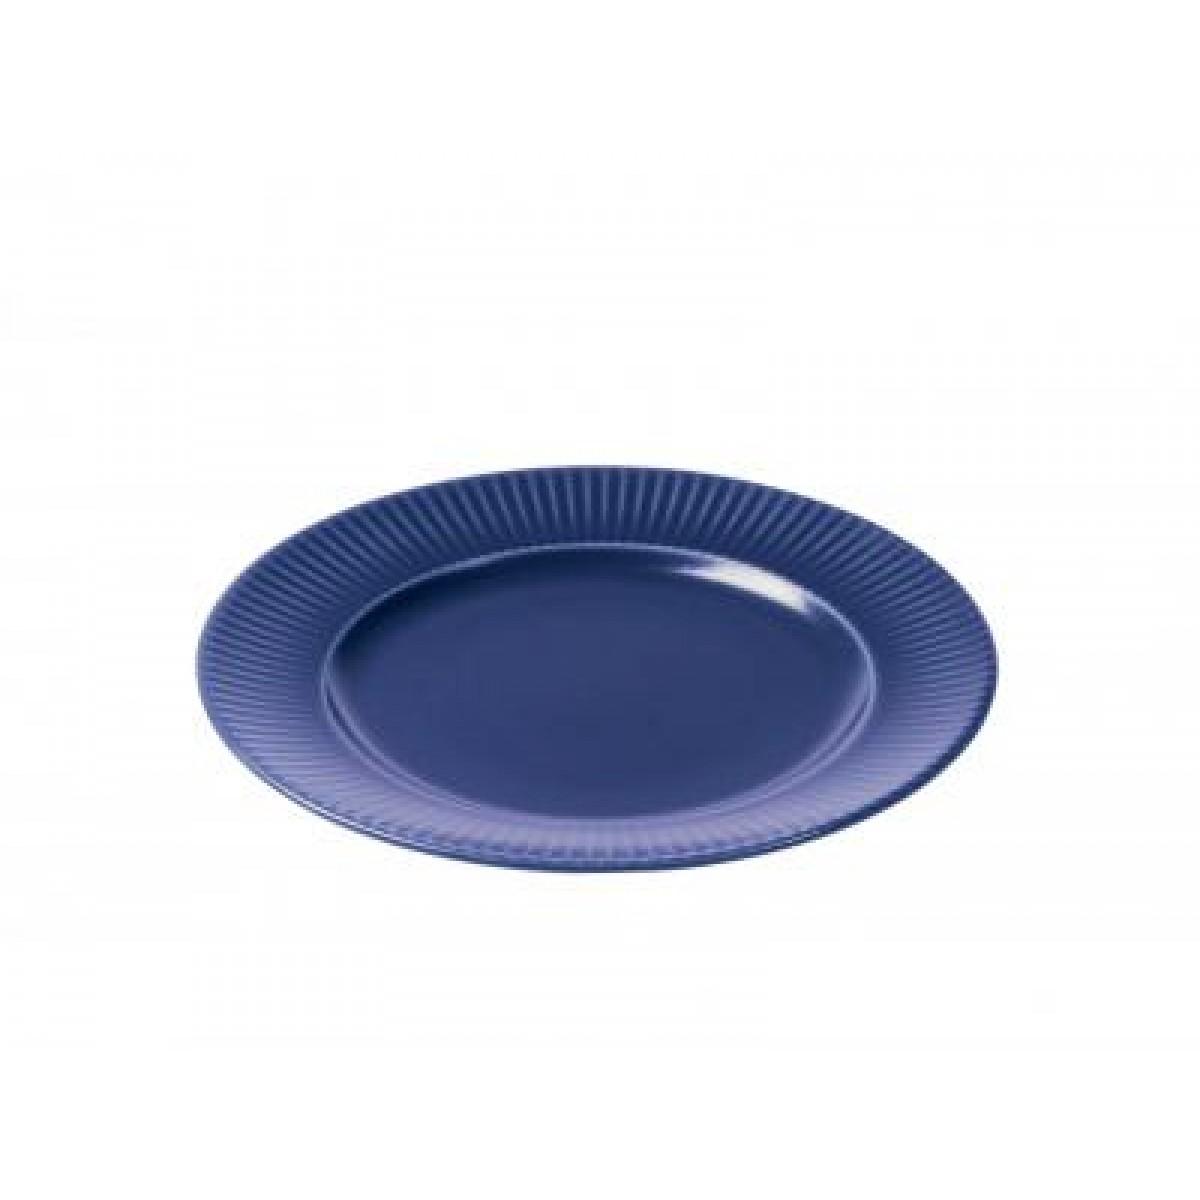 AIDA Groovy blå tallerken 27 cm stentøj